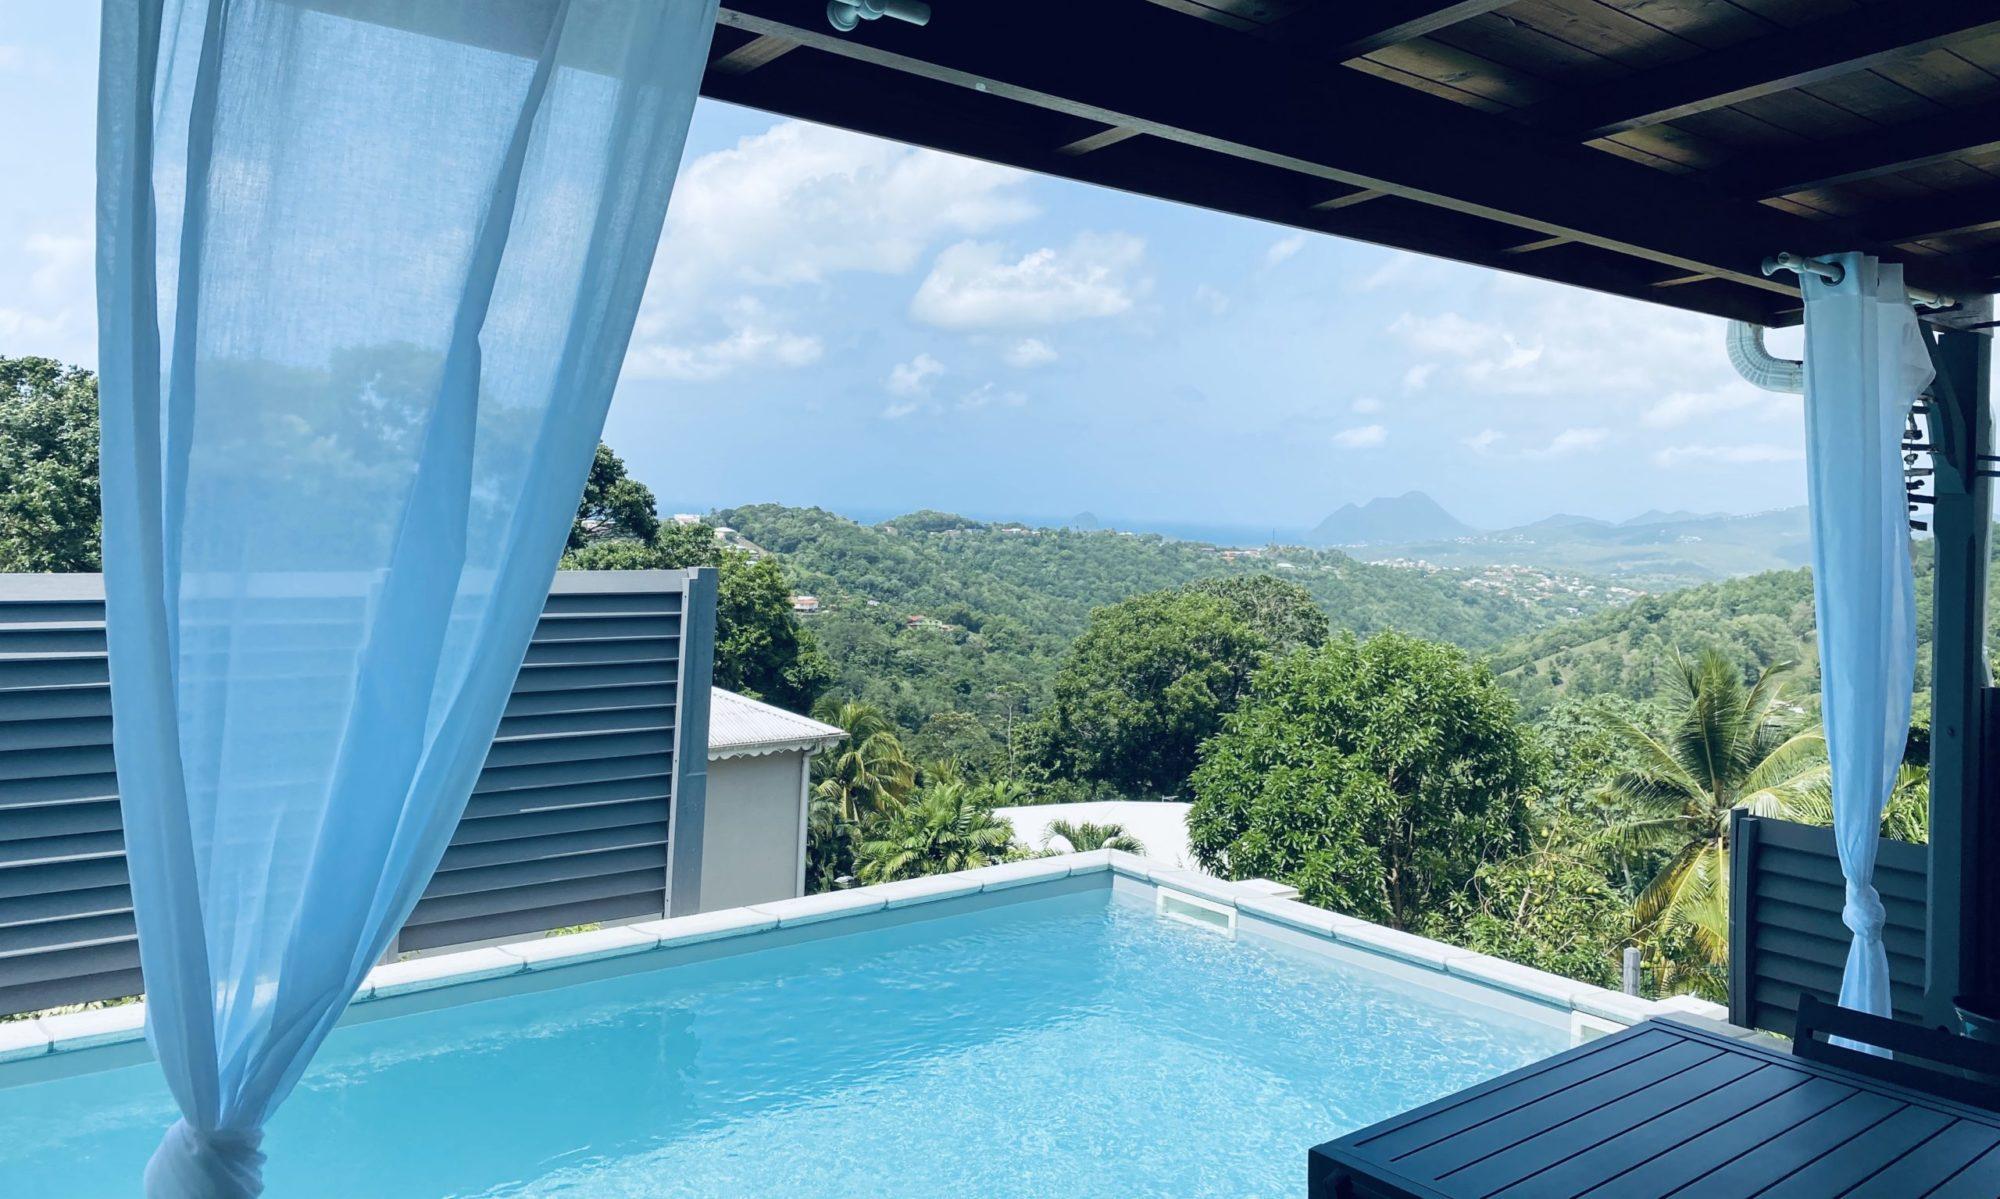 Location de vacances avec piscine en Martinique - Relyzen